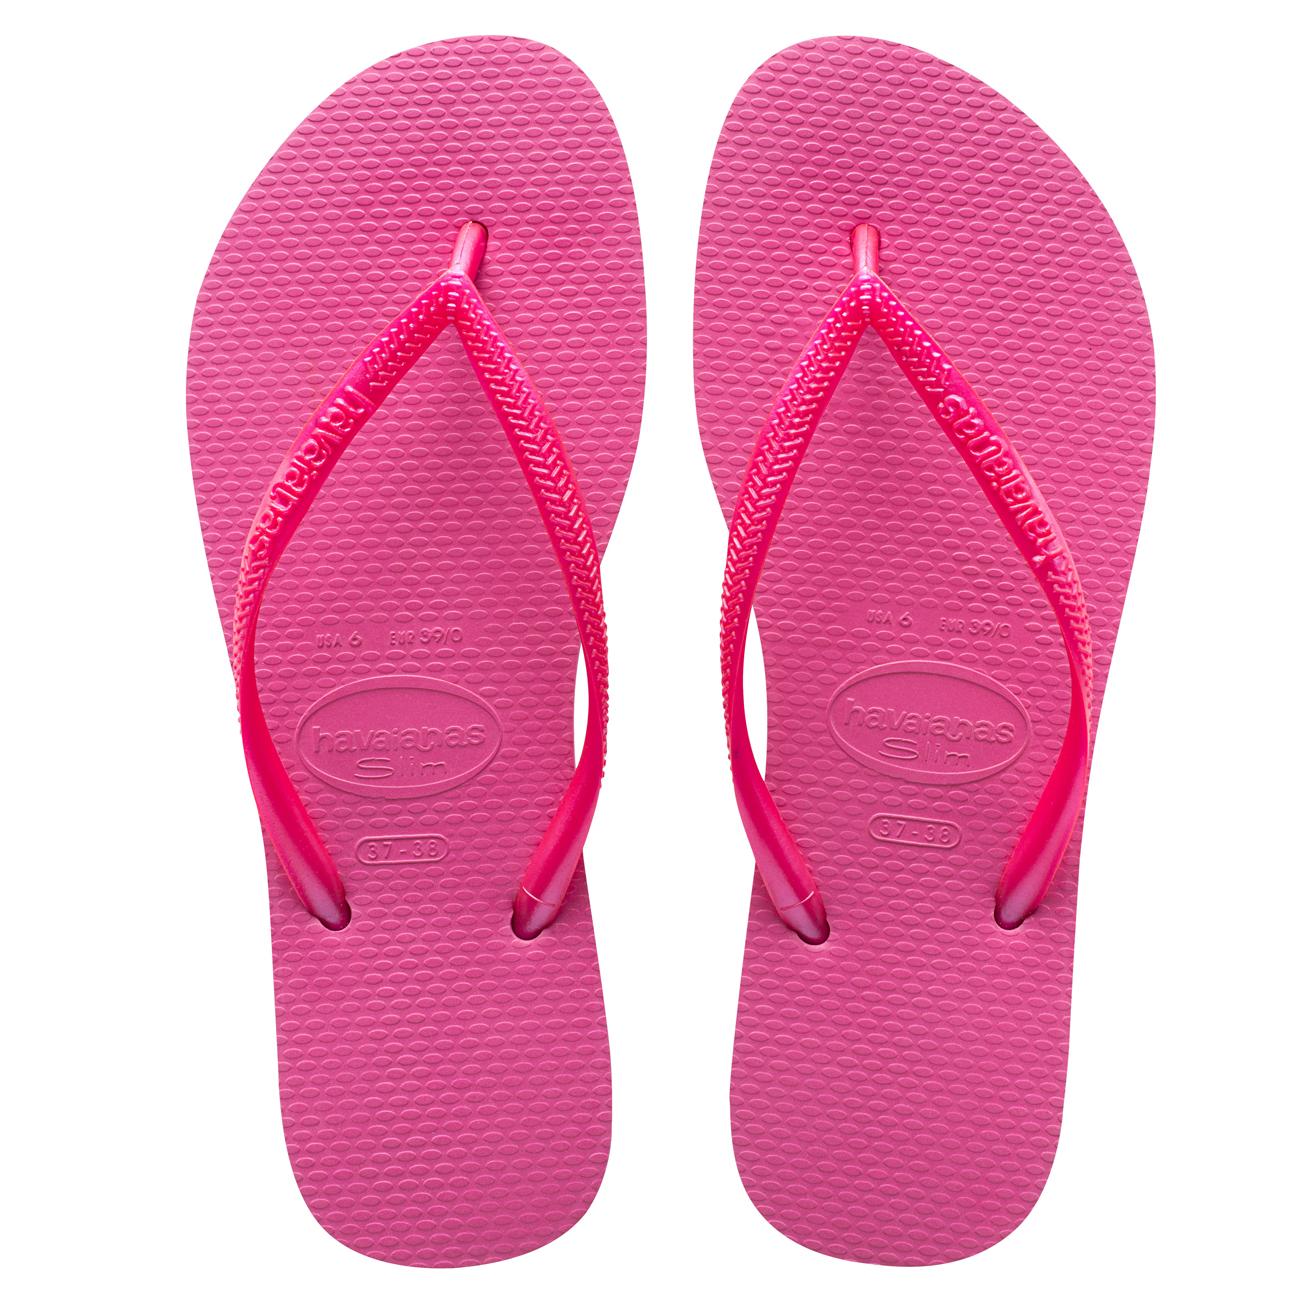 8f0f0837e9f05 Womens Havaianas Spring Beach Thongs Brazil Summer Floral Flip Flops ...